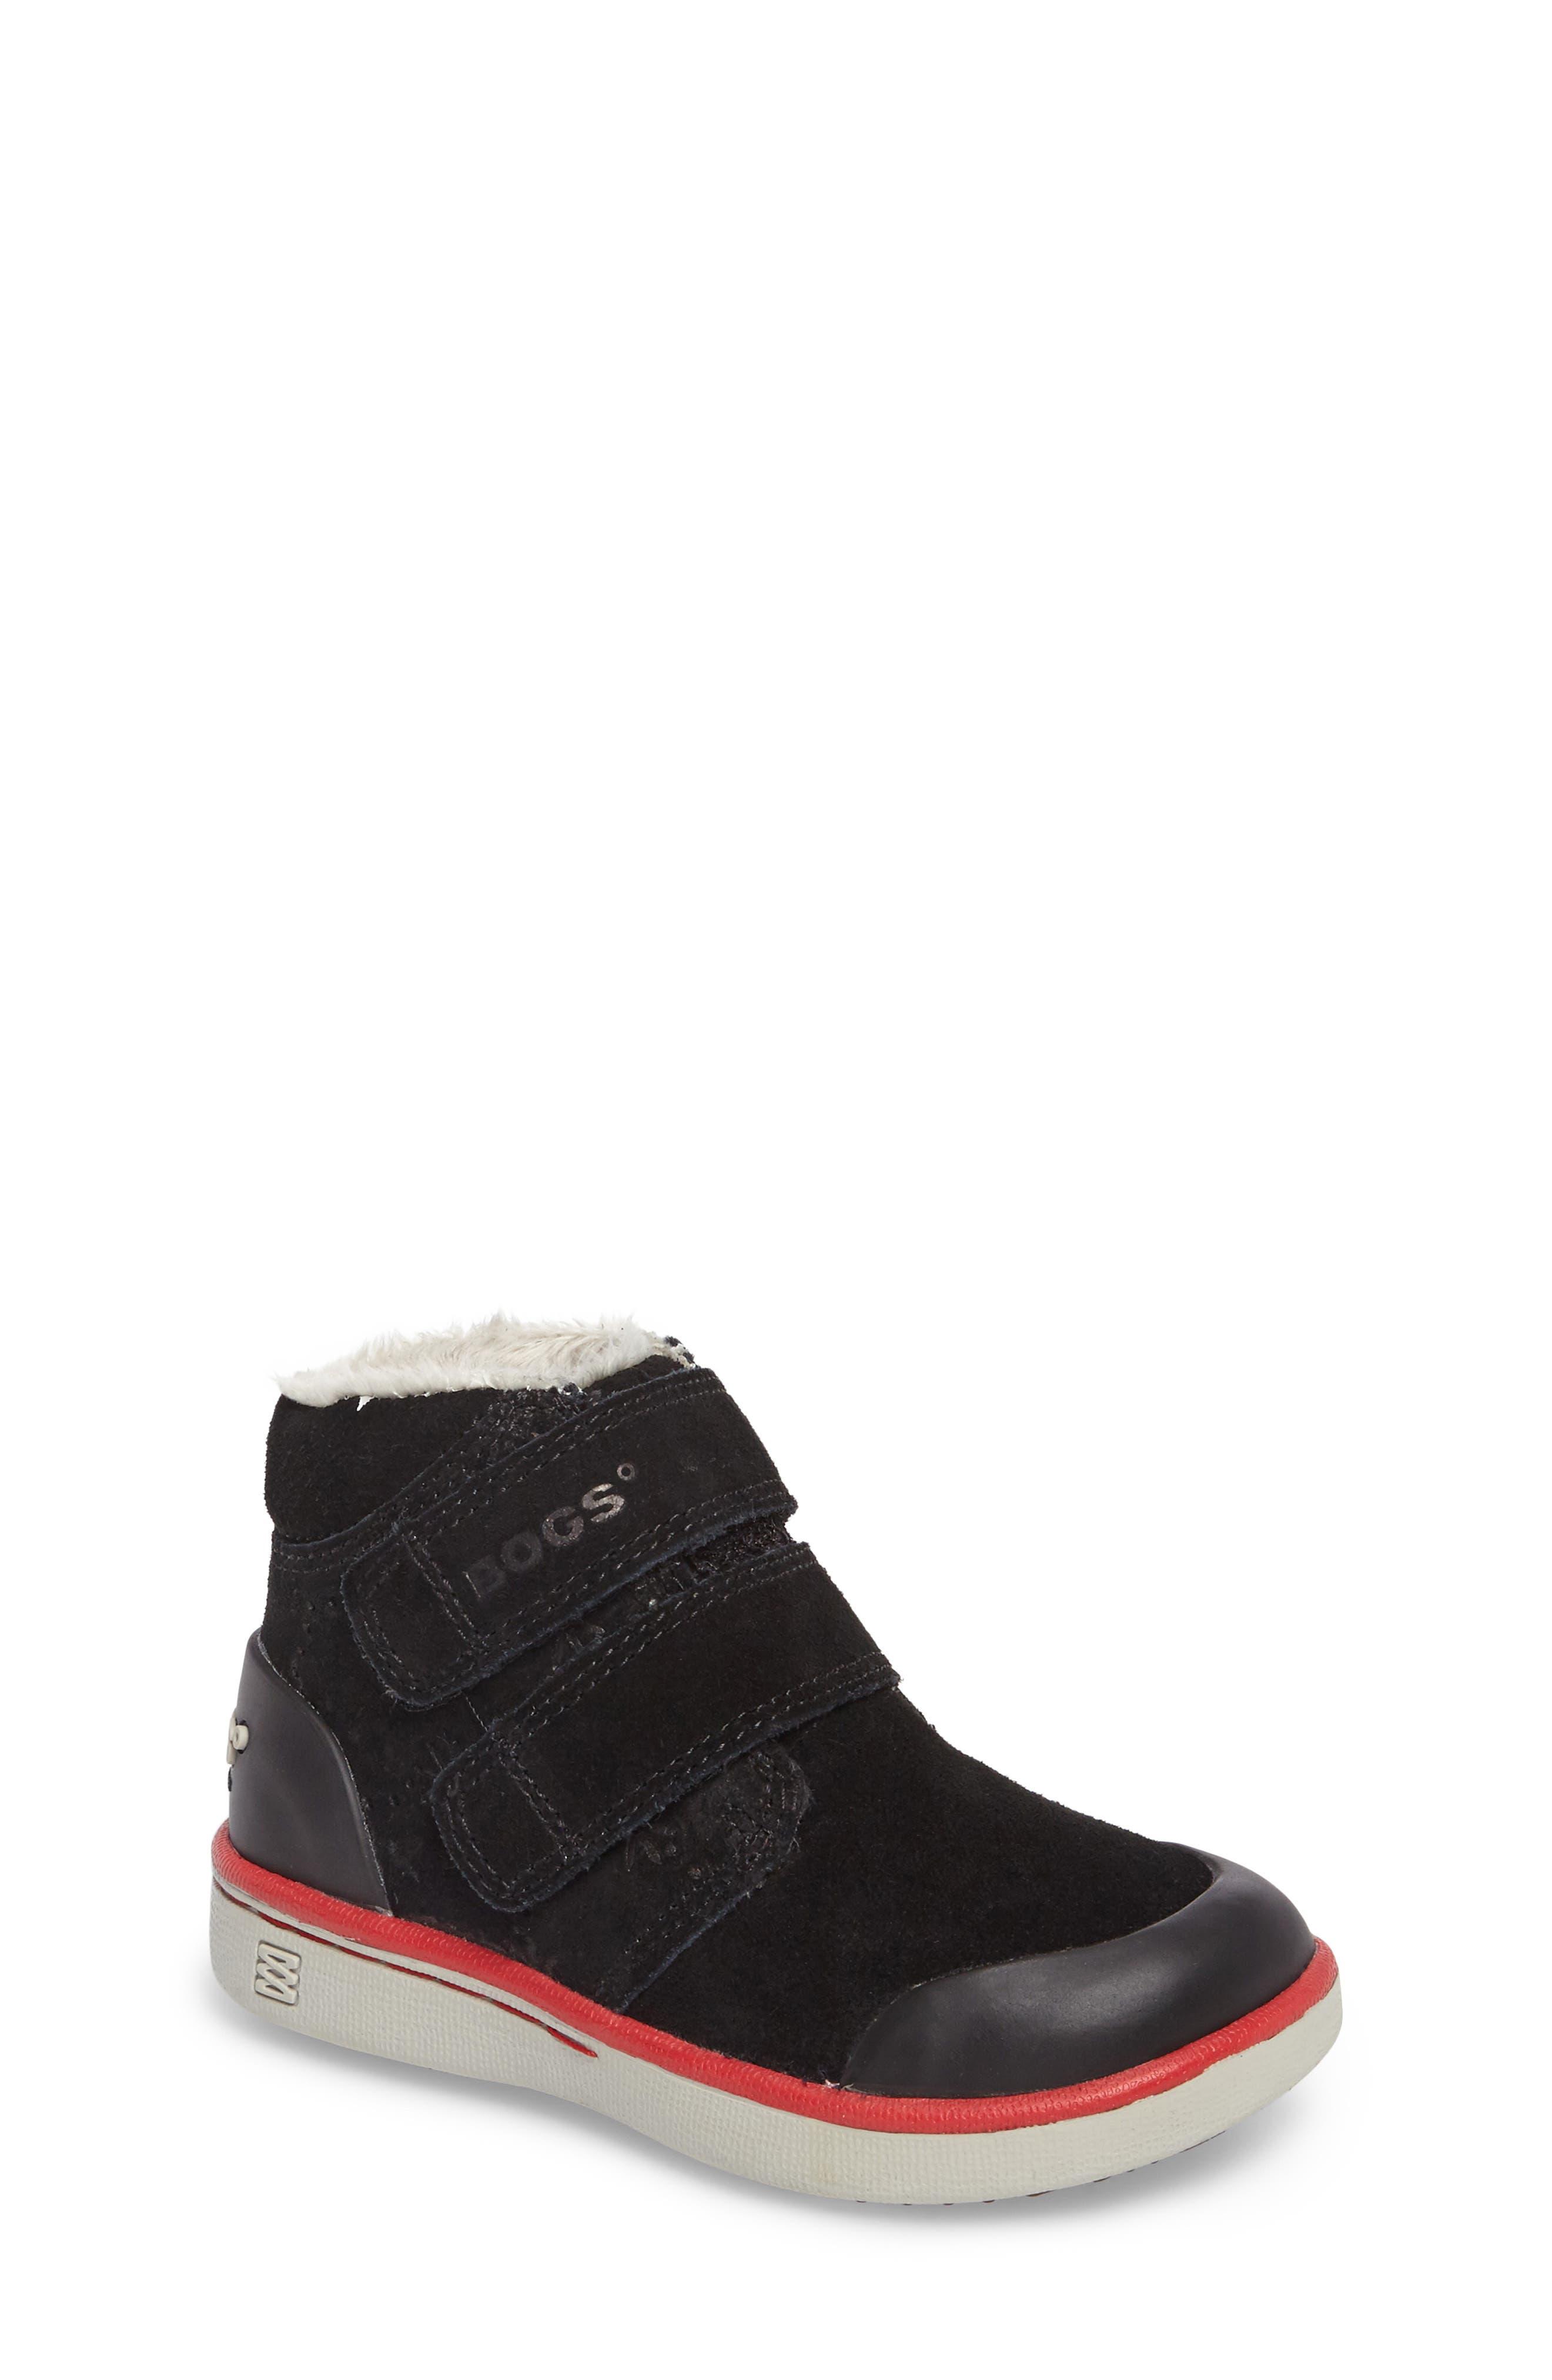 Samantha Faux Fur Waterproof Boot,                         Main,                         color, Black/ Black